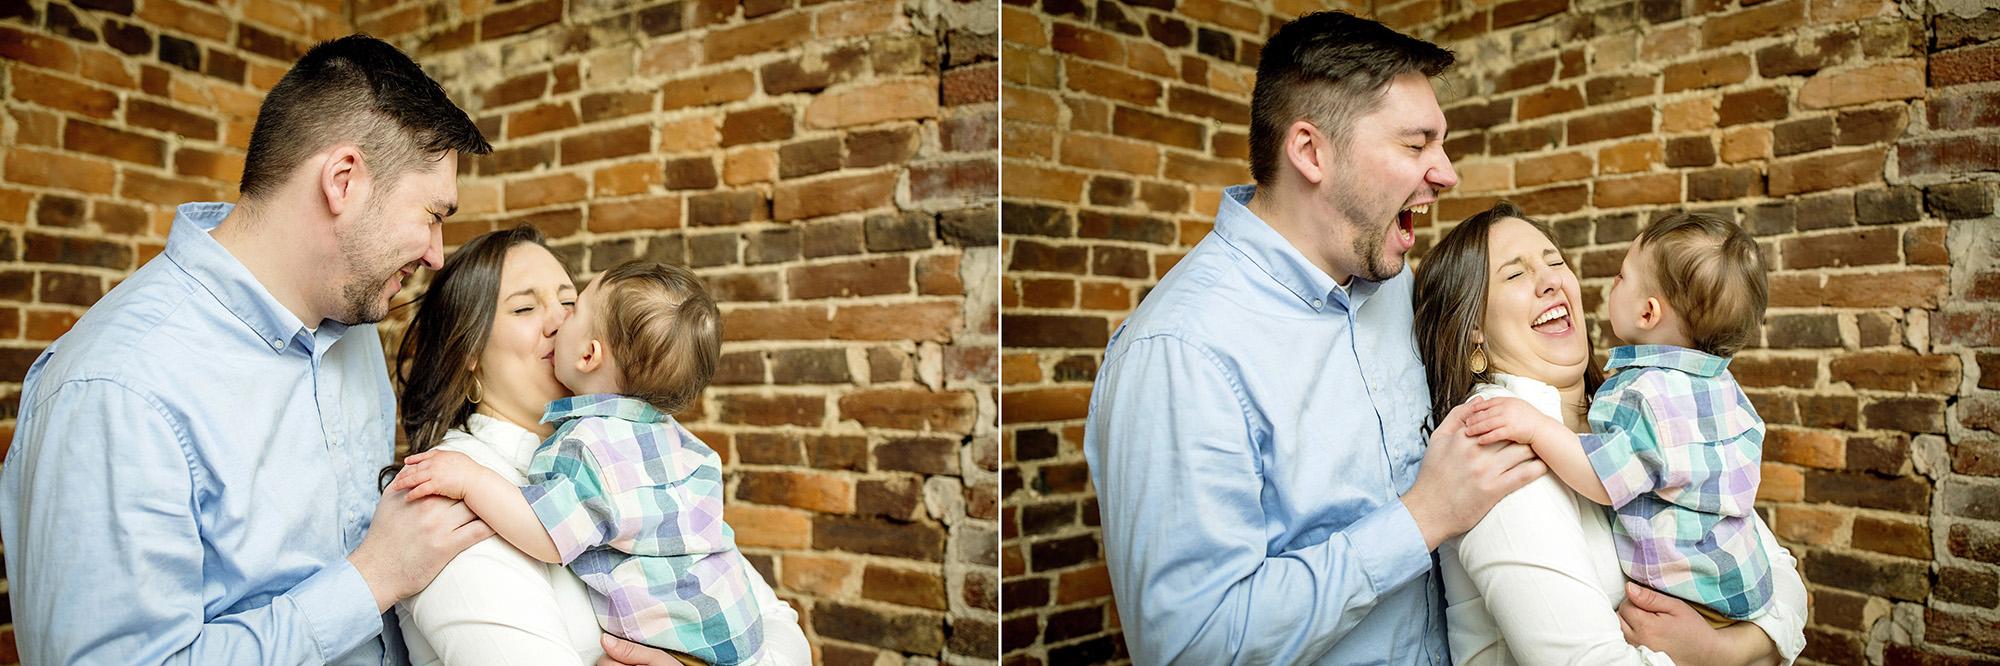 Seriously_Sabrina_Photography_Lexington_Kentucky_Studio_Family_One_Portraits_Holmes_17.jpg